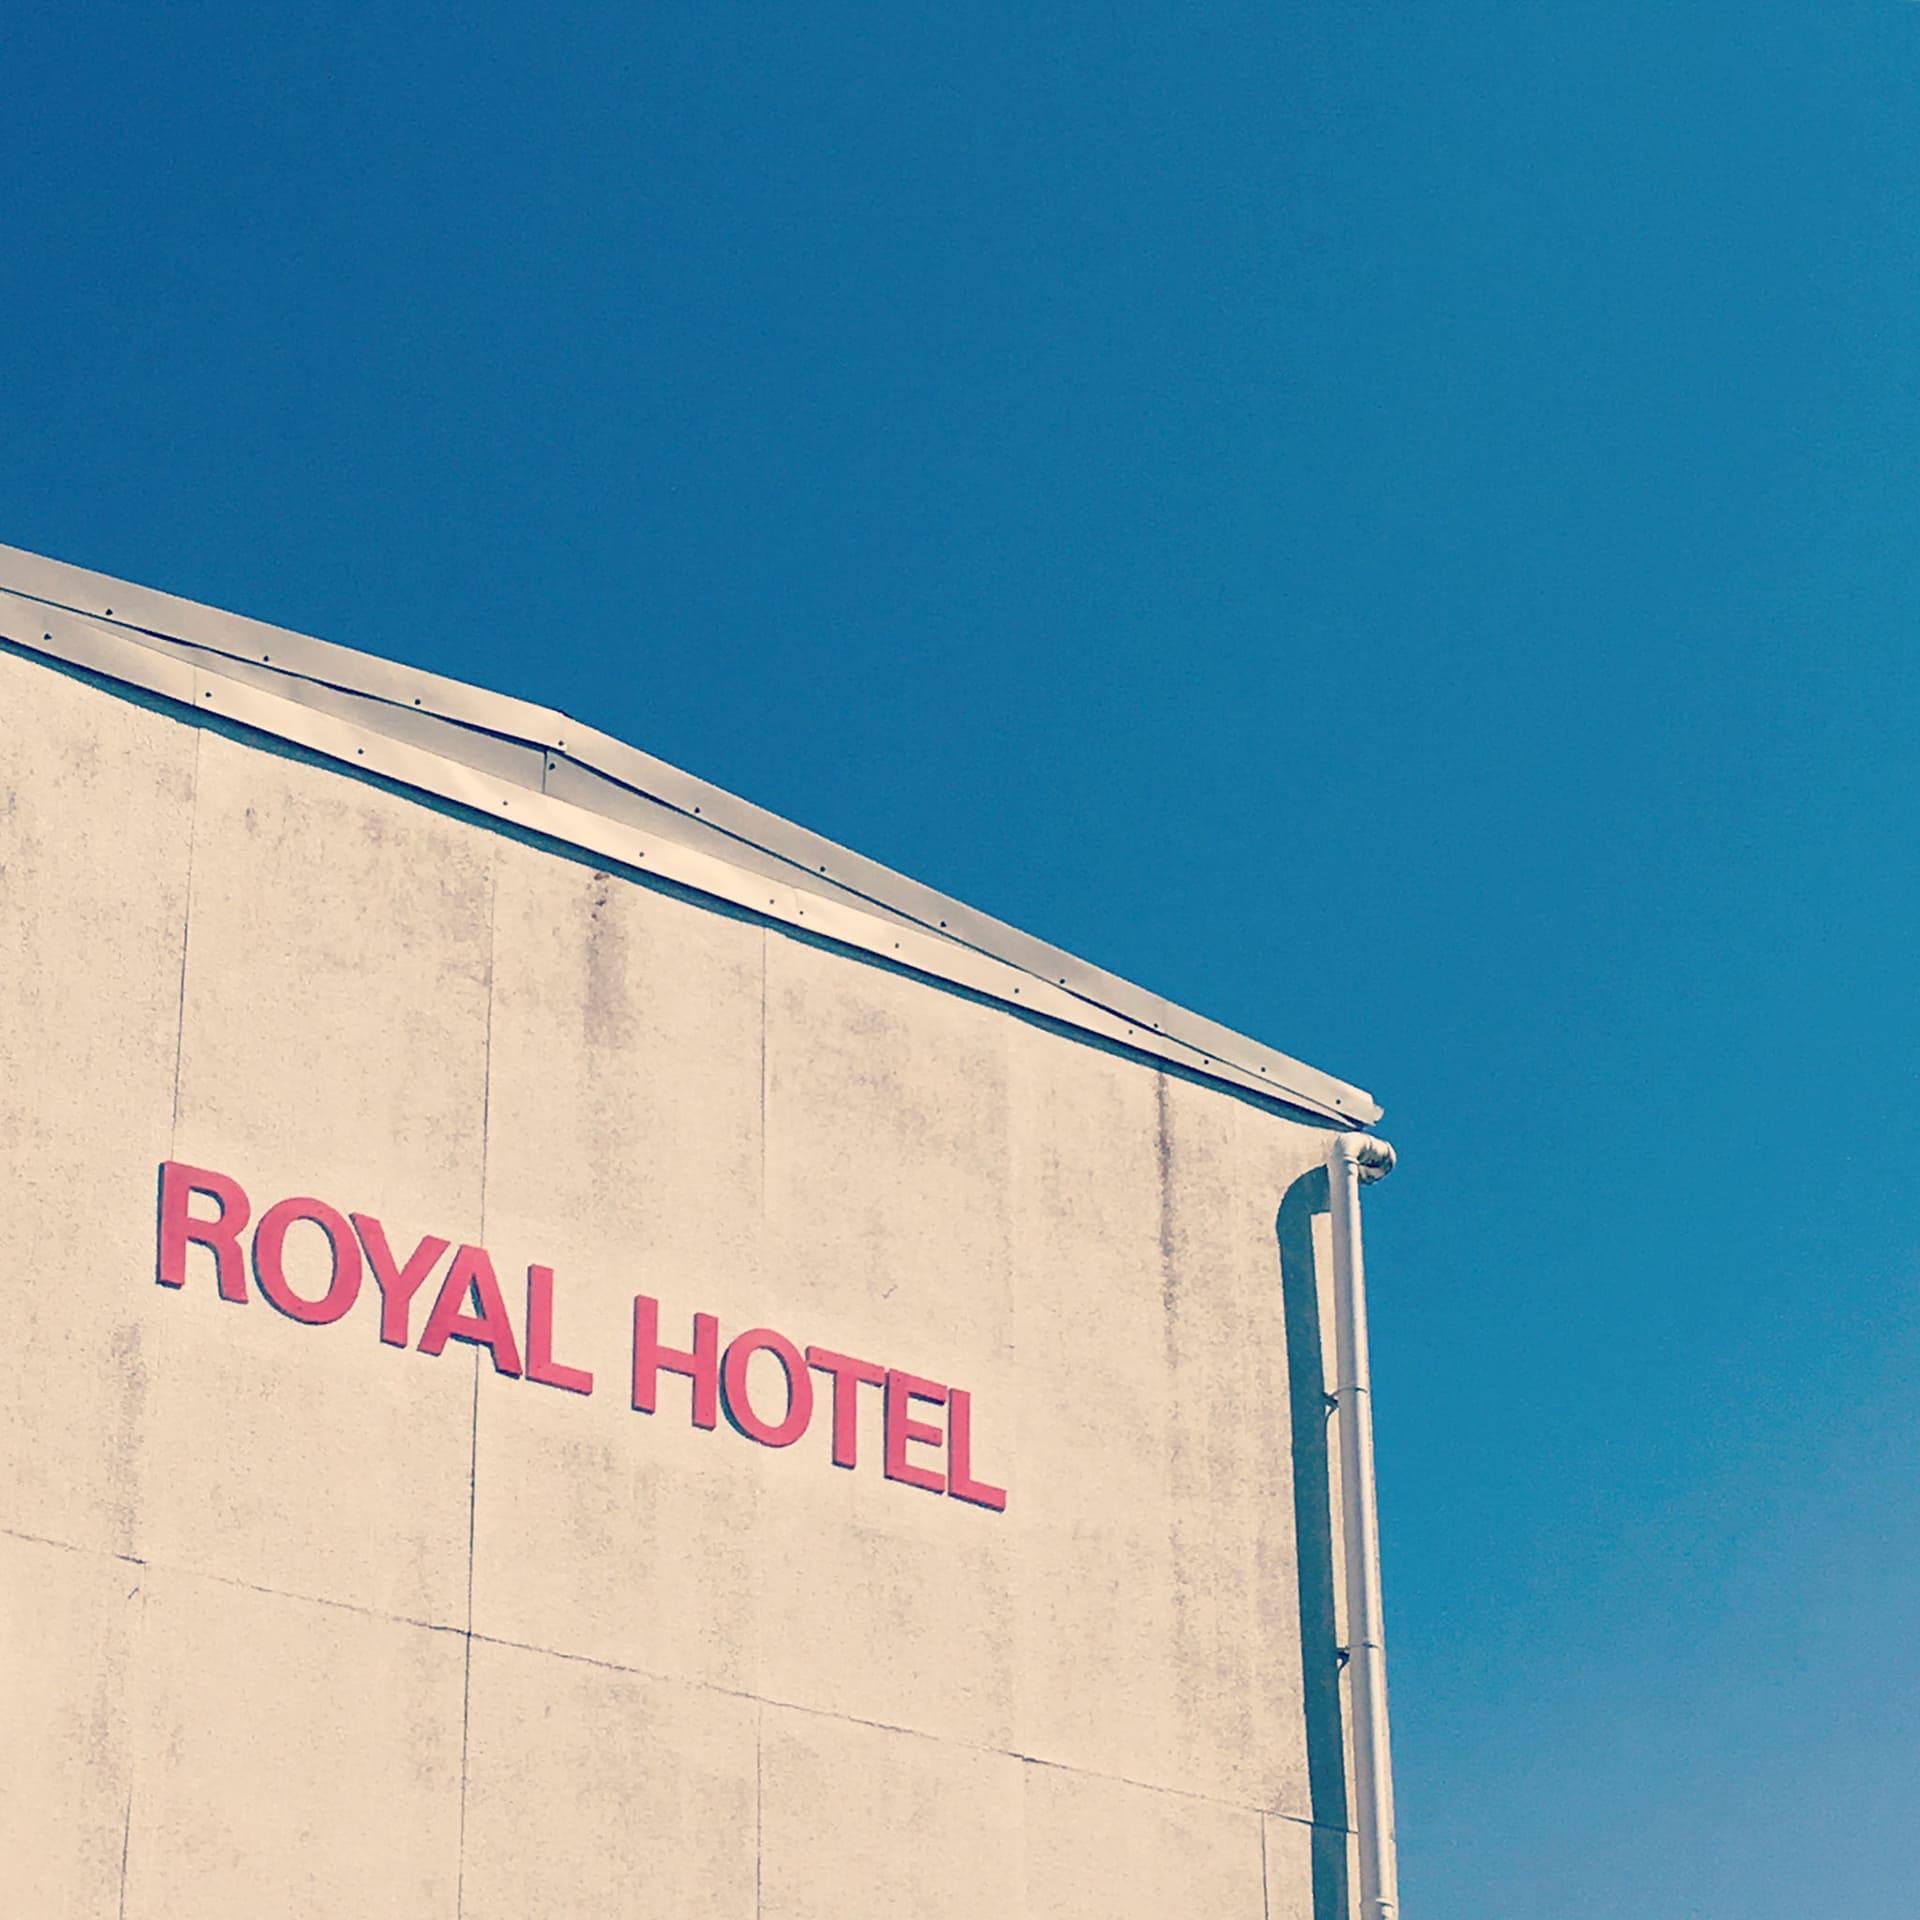 Seitliche Fassade des Royal Hotel, Isle of Wight